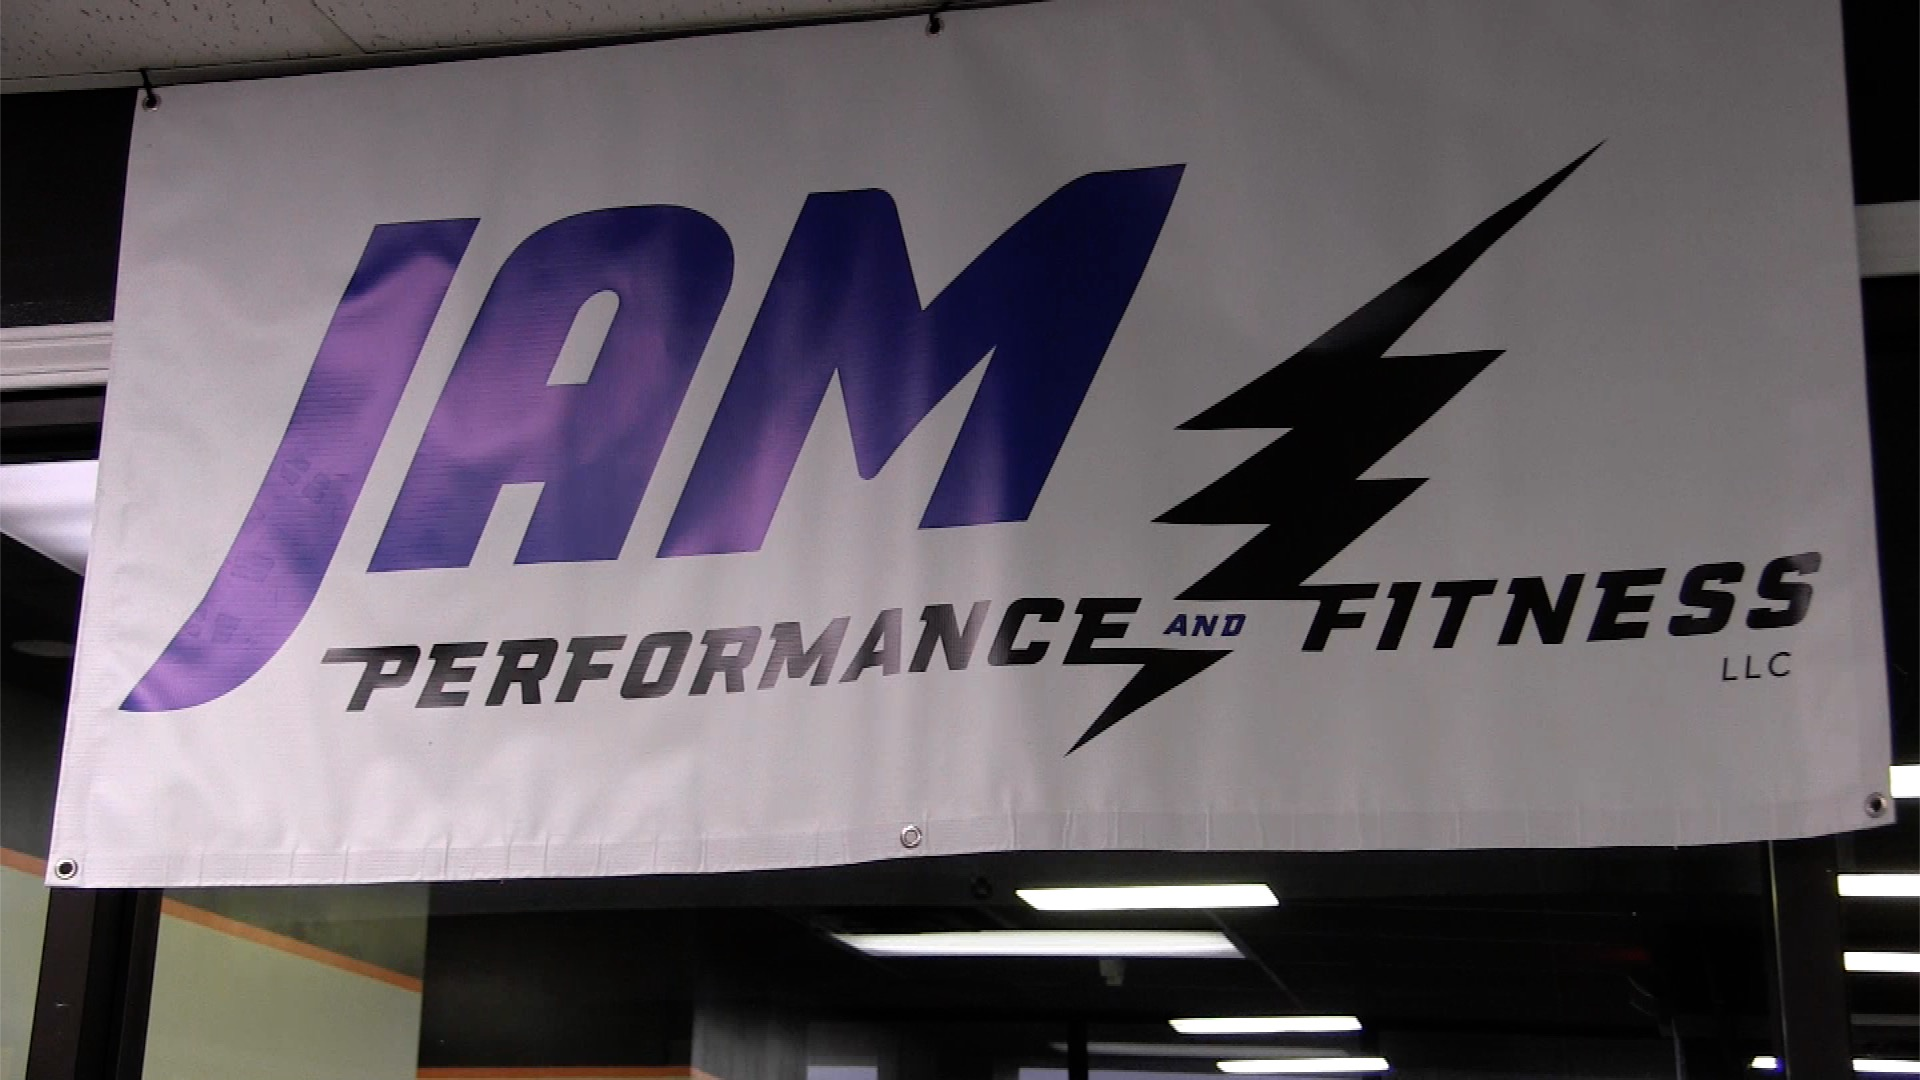 JAM Performance Fitness